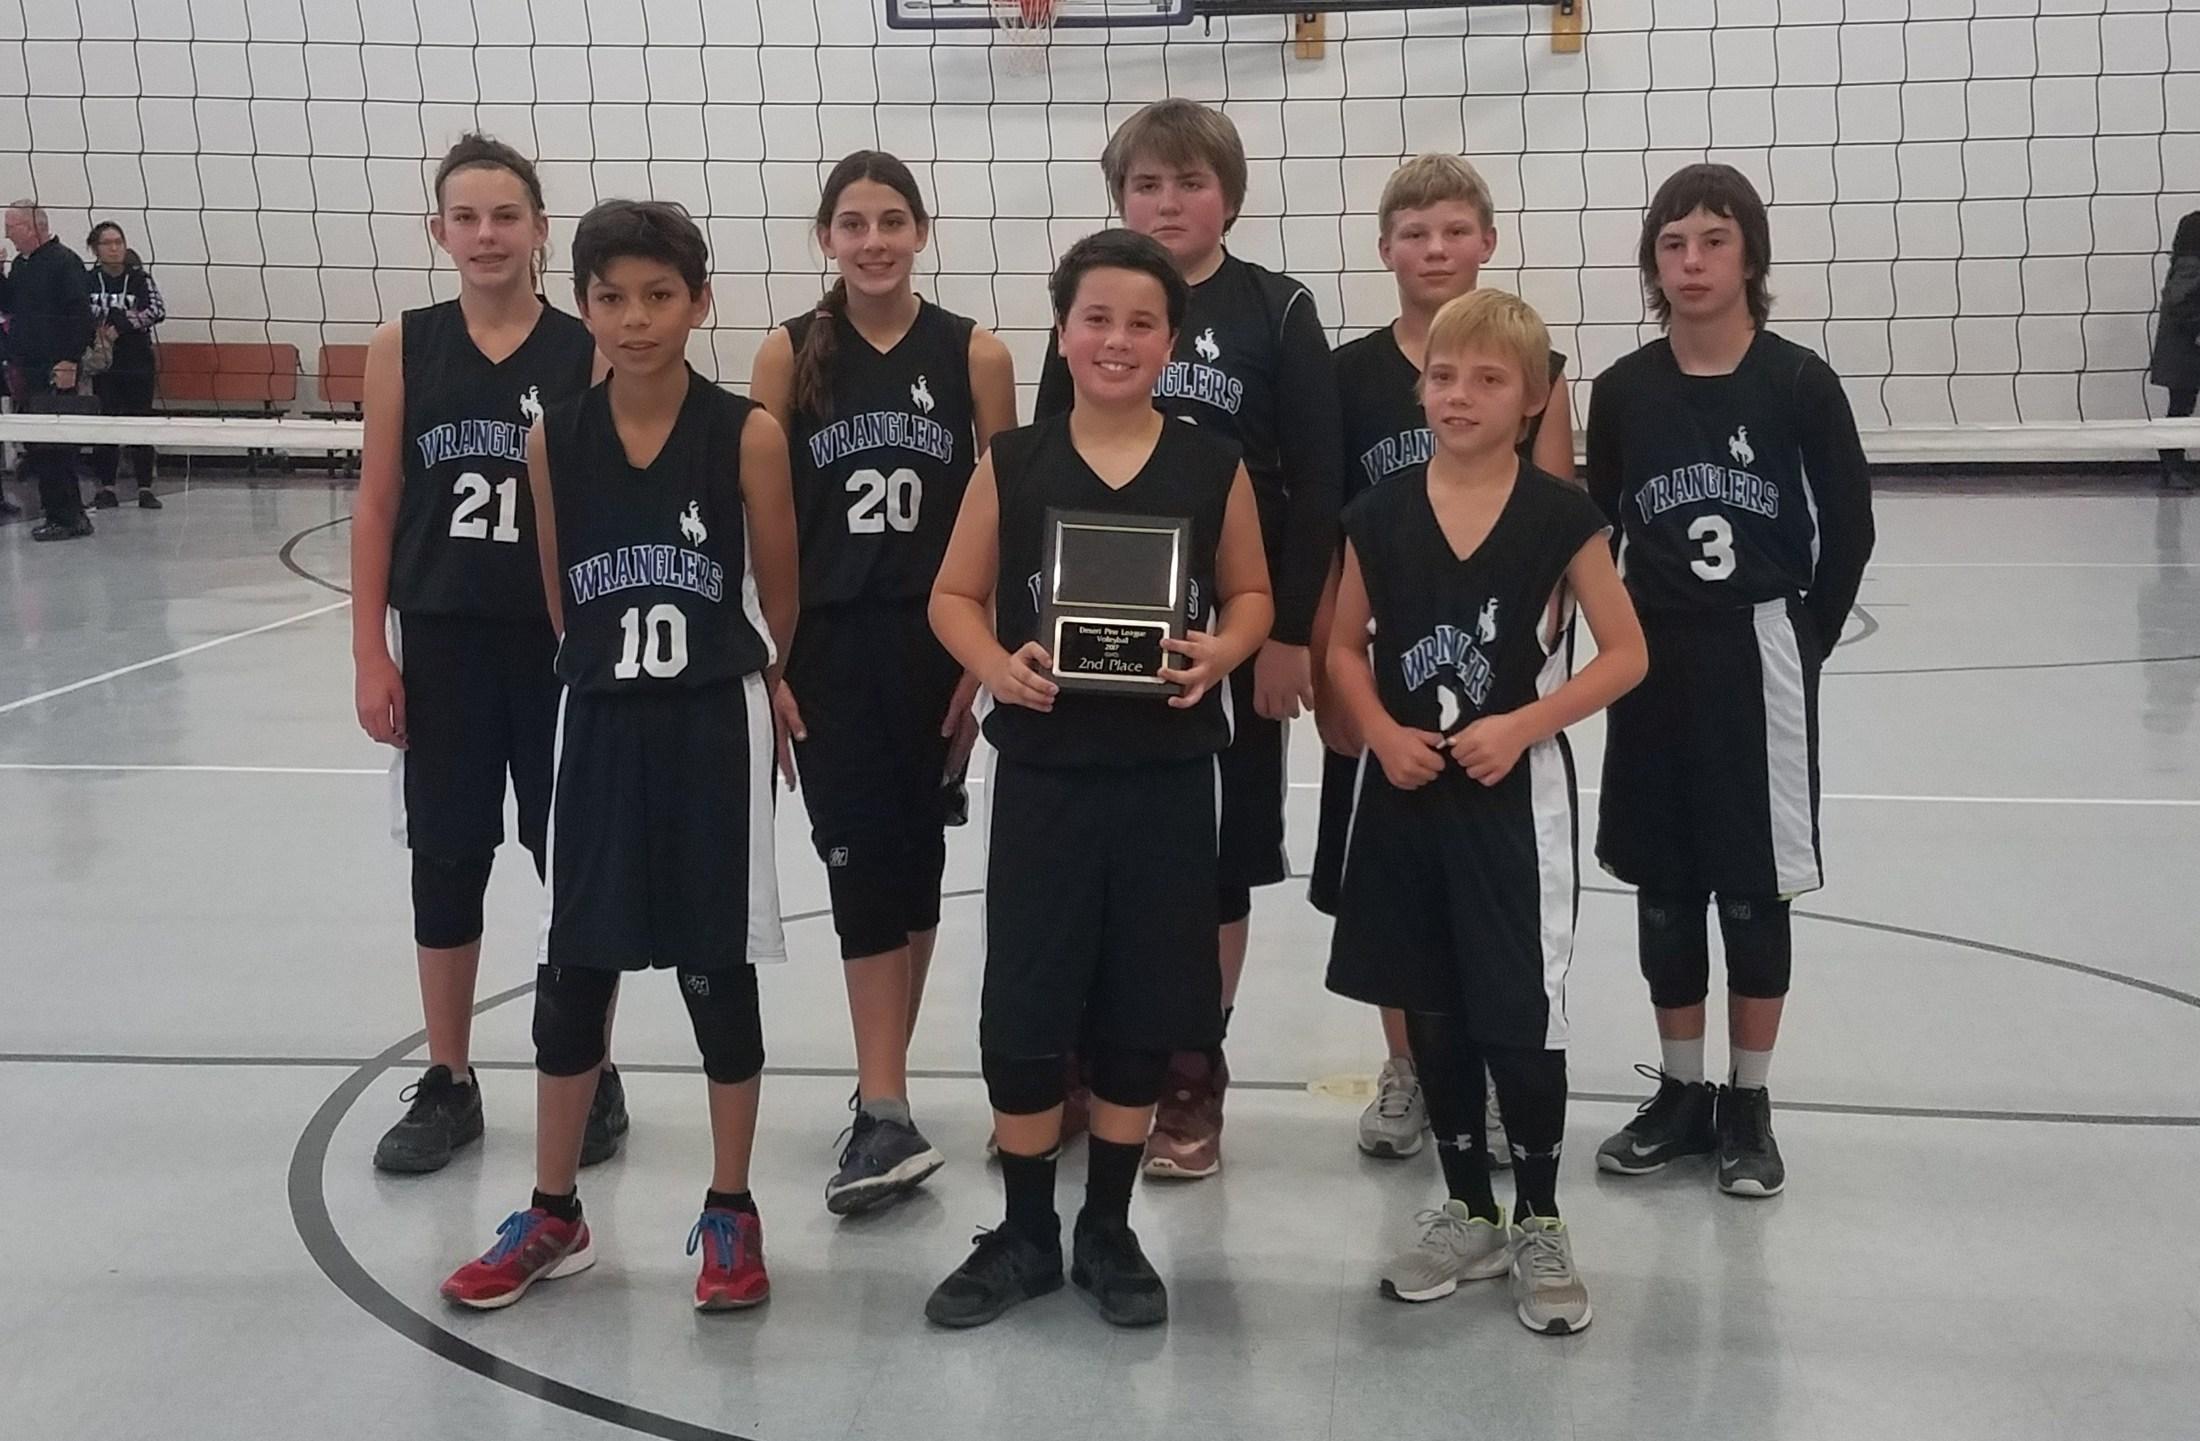 Wranglers 2018 Team